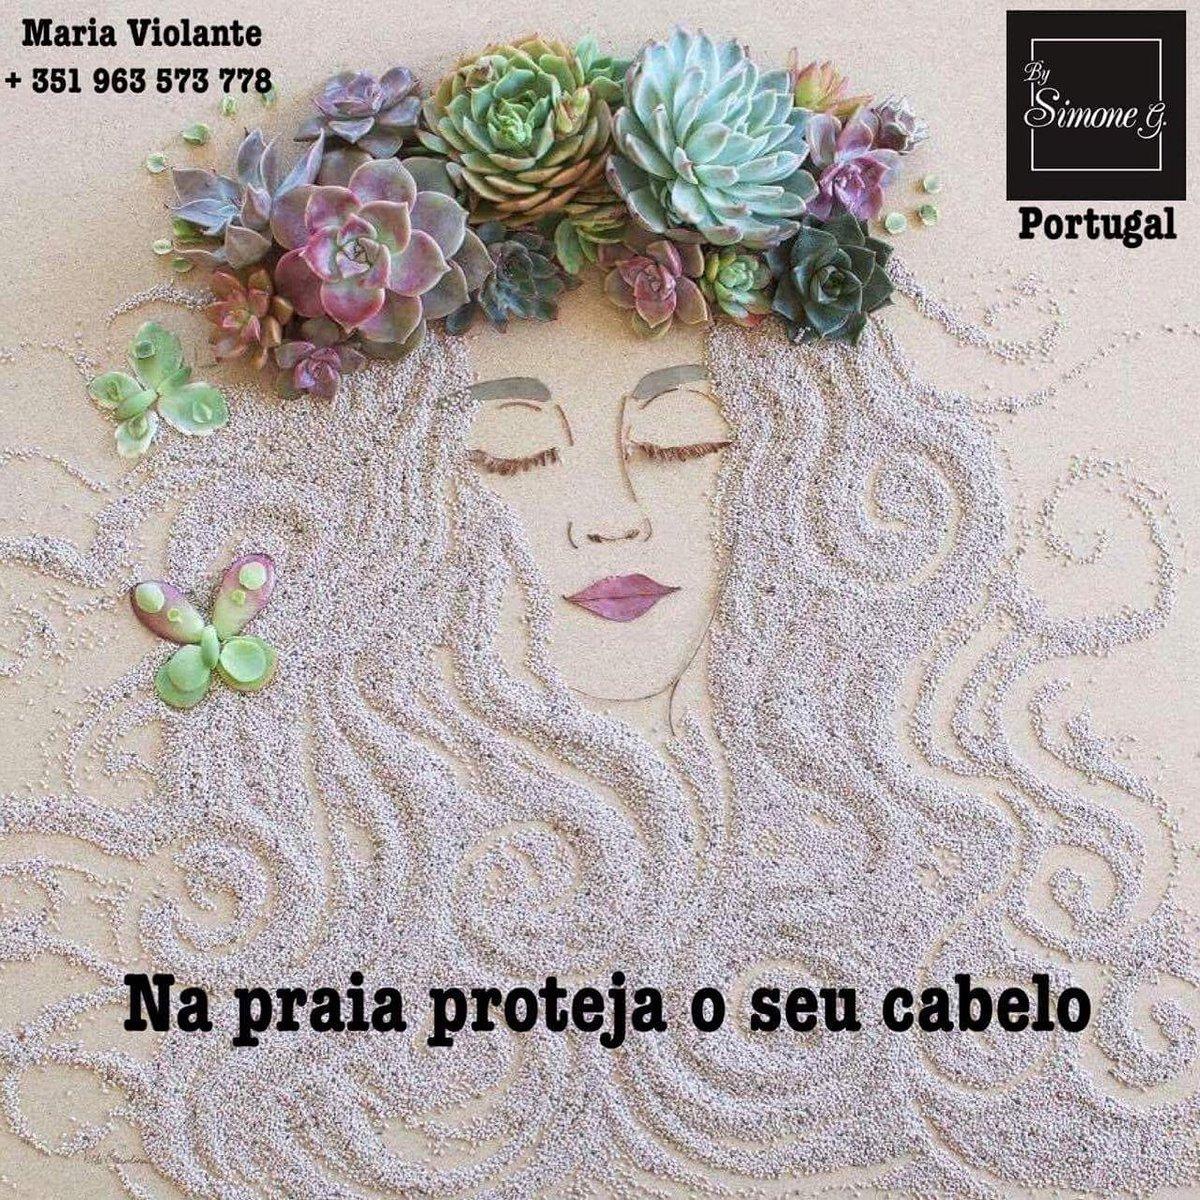 #bysimoneg #thricology #tricologia #hairdressers #cabeleireiros #tratamentoscapilares#sun #sol #praia #beachpic.twitter.com/vX0Vk1Hr31